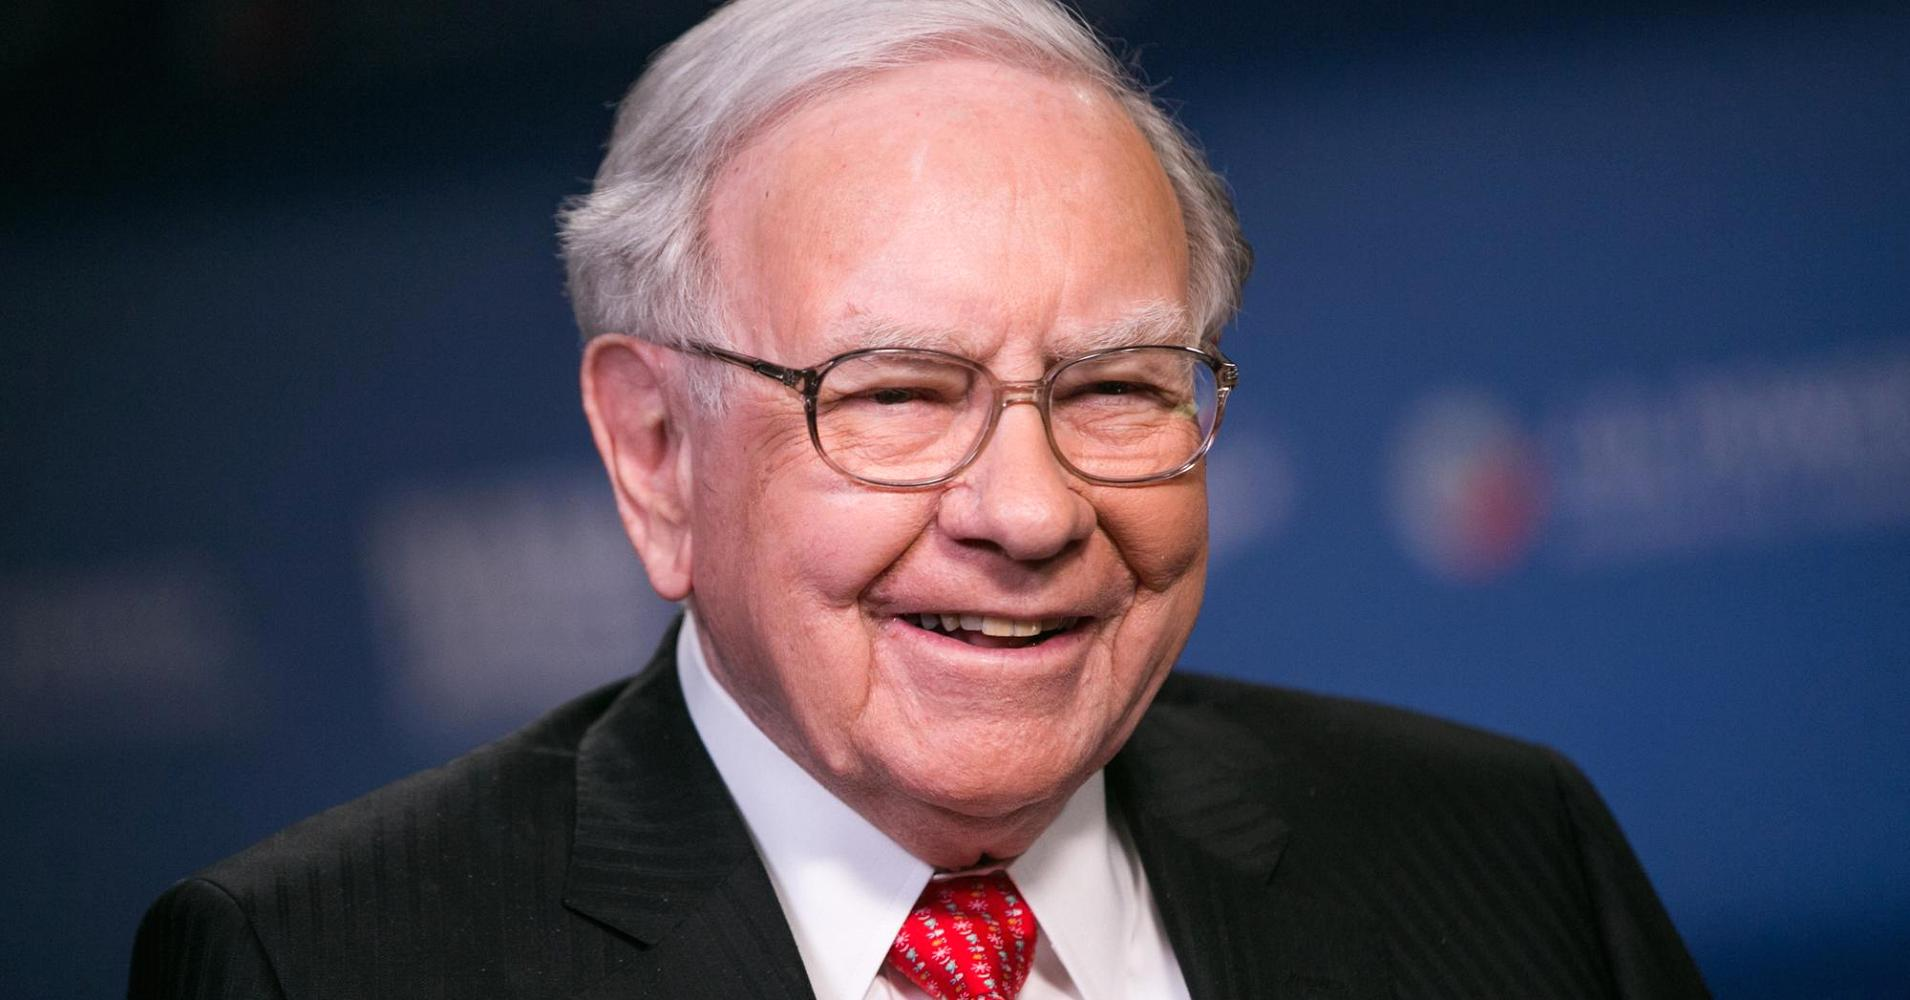 Cổ phiếu Apple,Cổ phiếu Apple,Cổ phiếu Apple Cổ phiếu Apple - Cổ phiếu Apple được tỉ phú Warren Buffett mua nhiều nhất